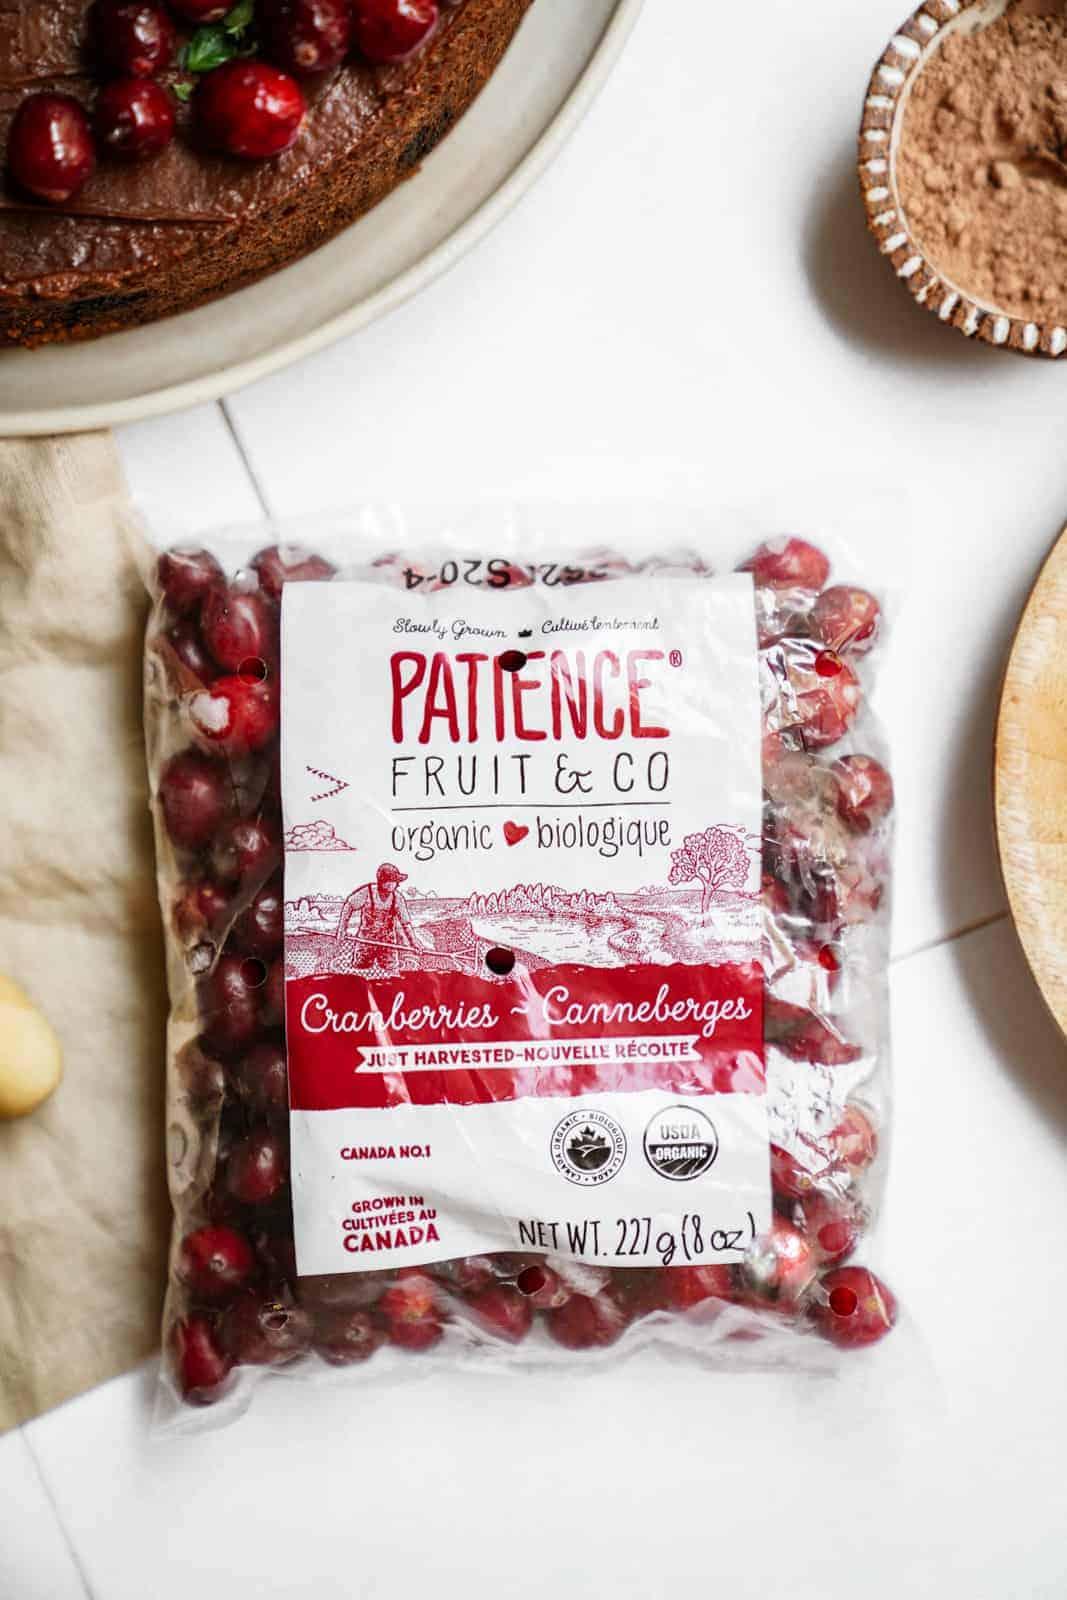 A bag of Patience Fruit & Co. cranberries.